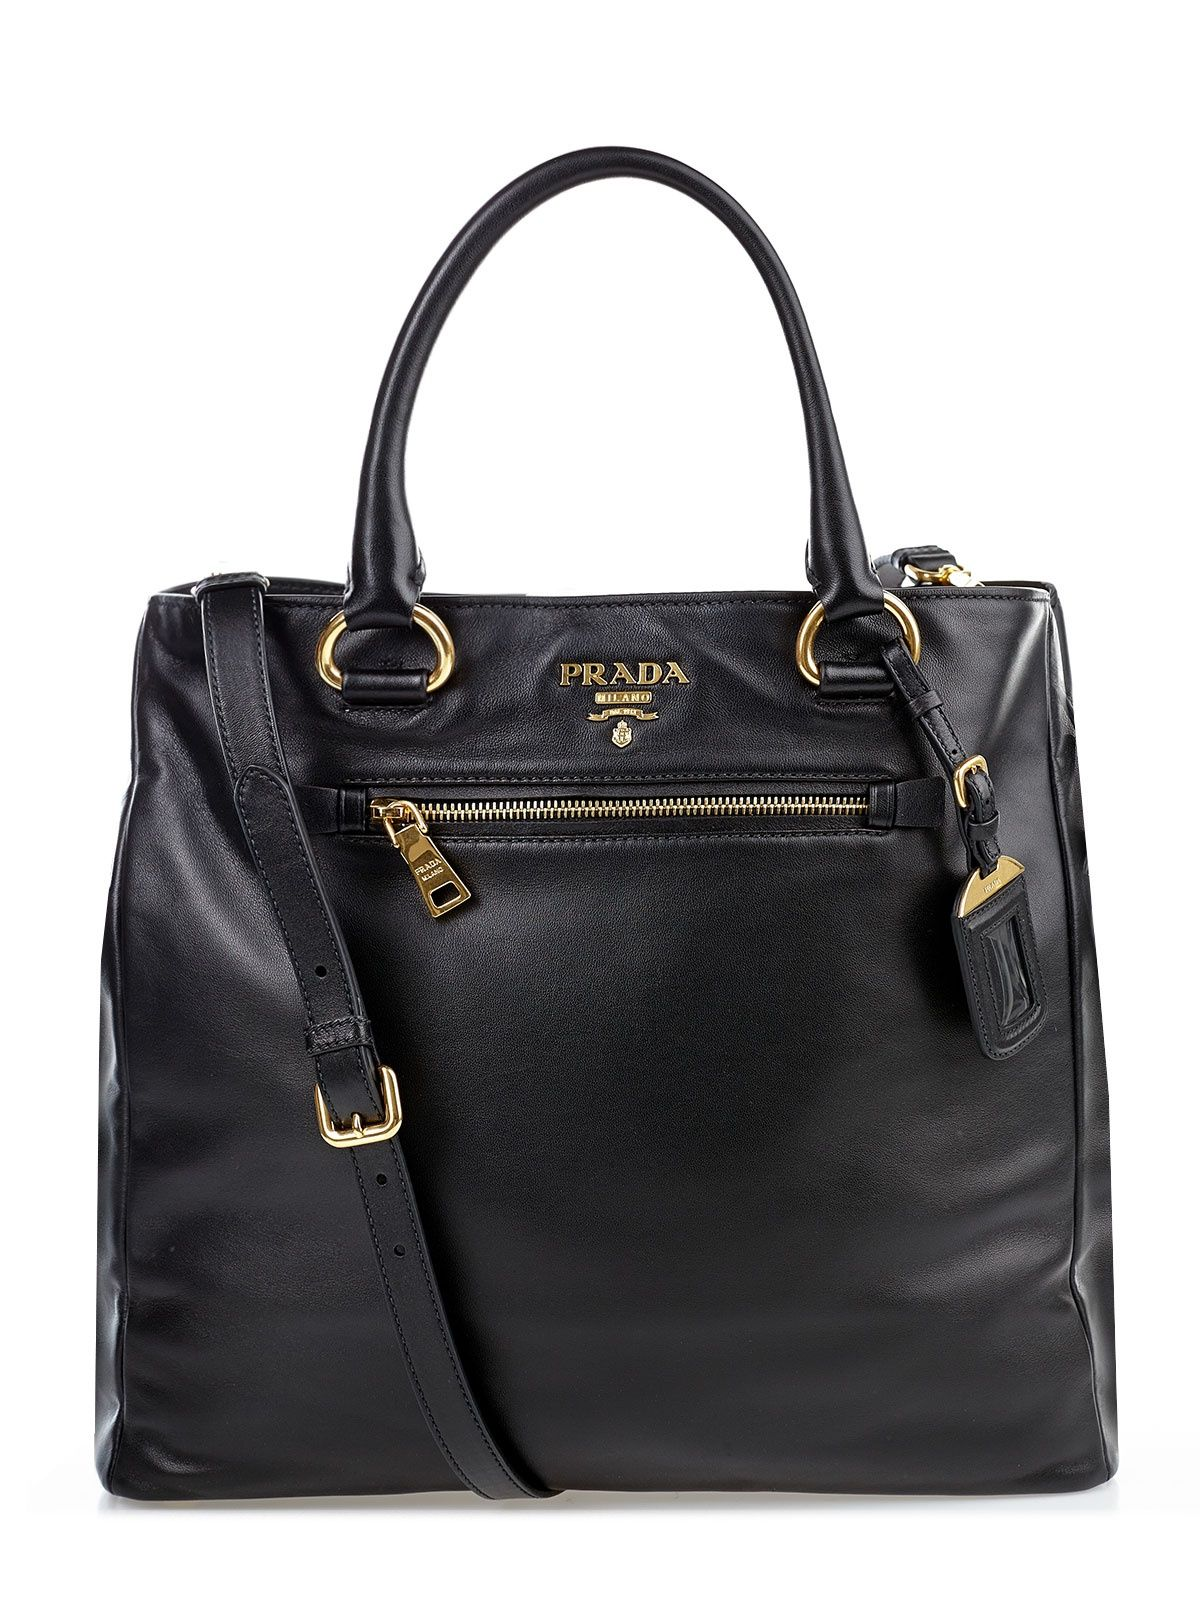 a473d05ffab2 Pin by Boutique On 57 on Designer handbags   Prada bag, Prada bag black,  Prada